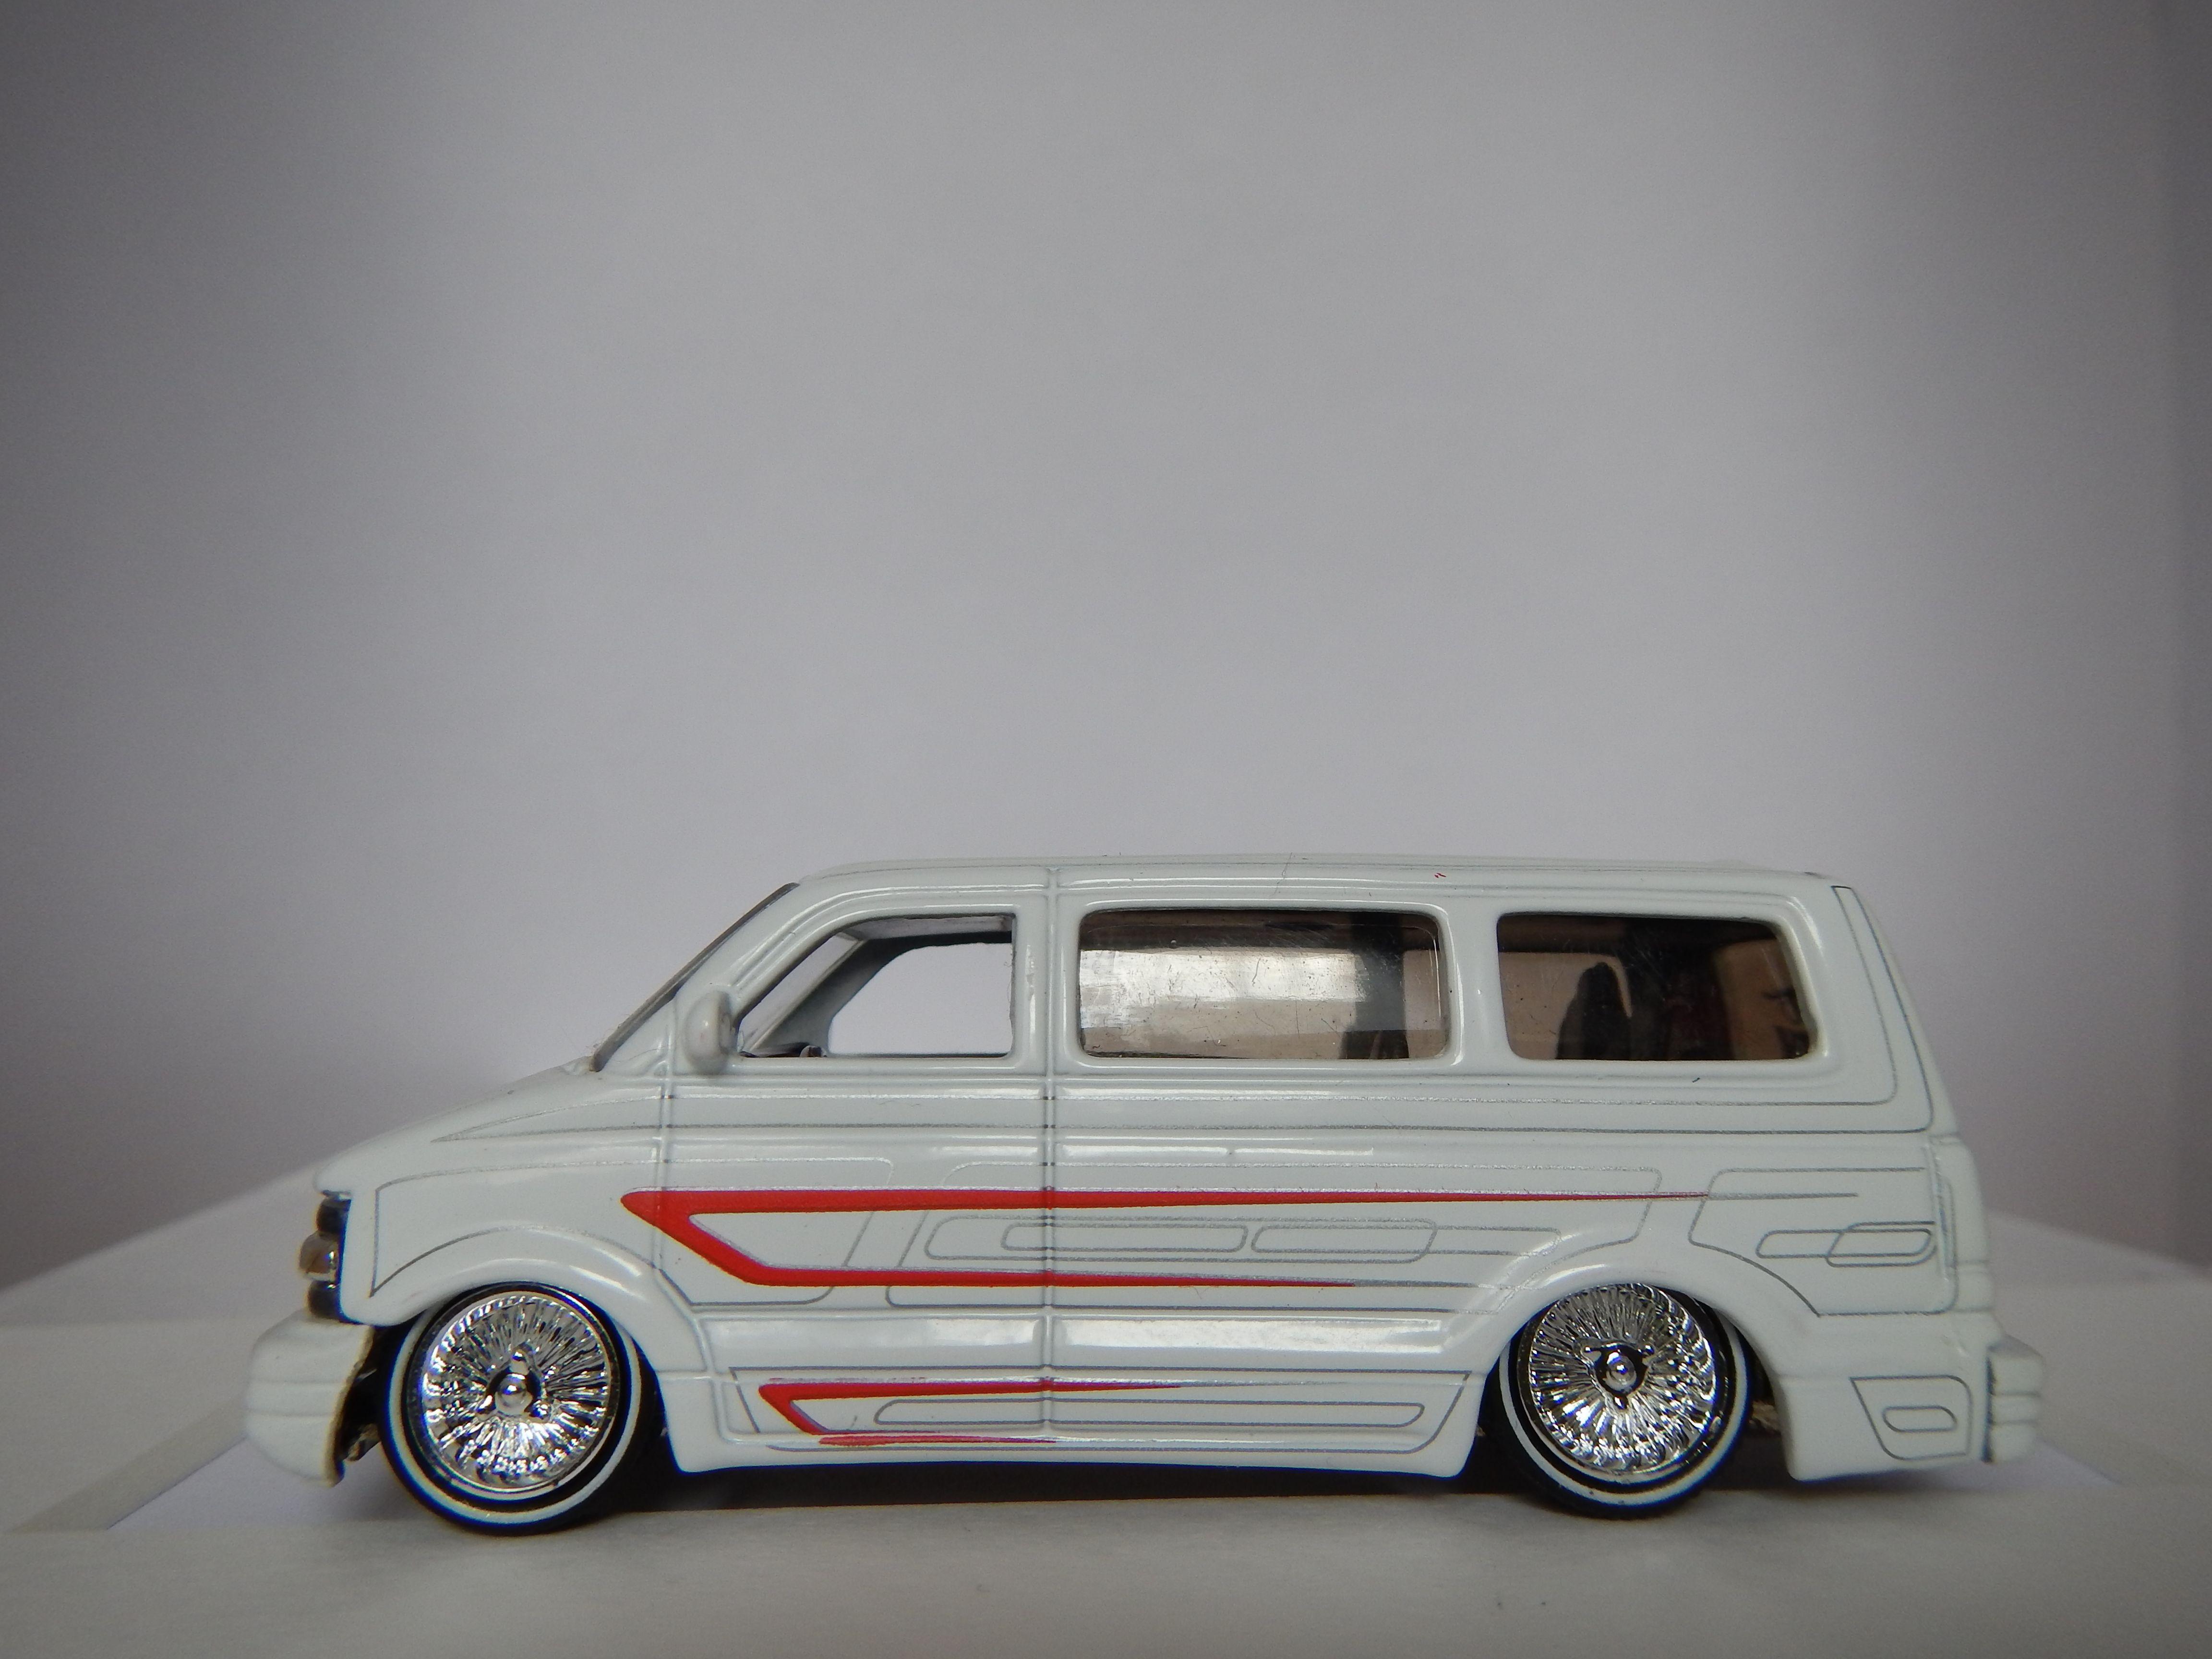 2001 Chevrolet Astro Van By Jada Toys China Chevy Astro Van Chevrolet Astro Astro Van